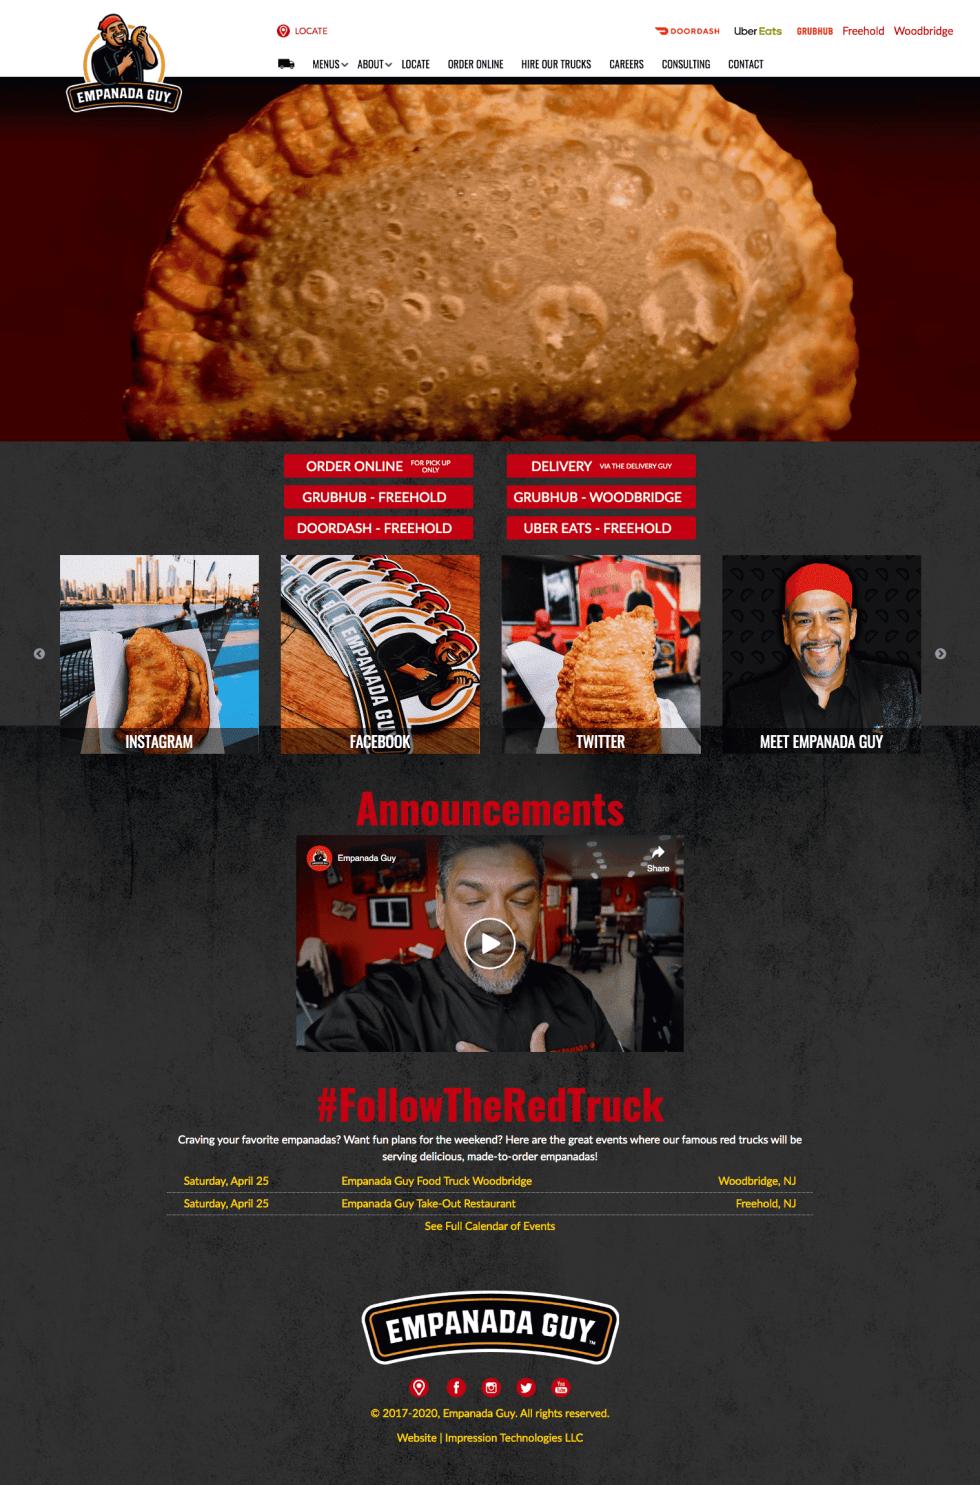 Image of Empanada Guy campaign